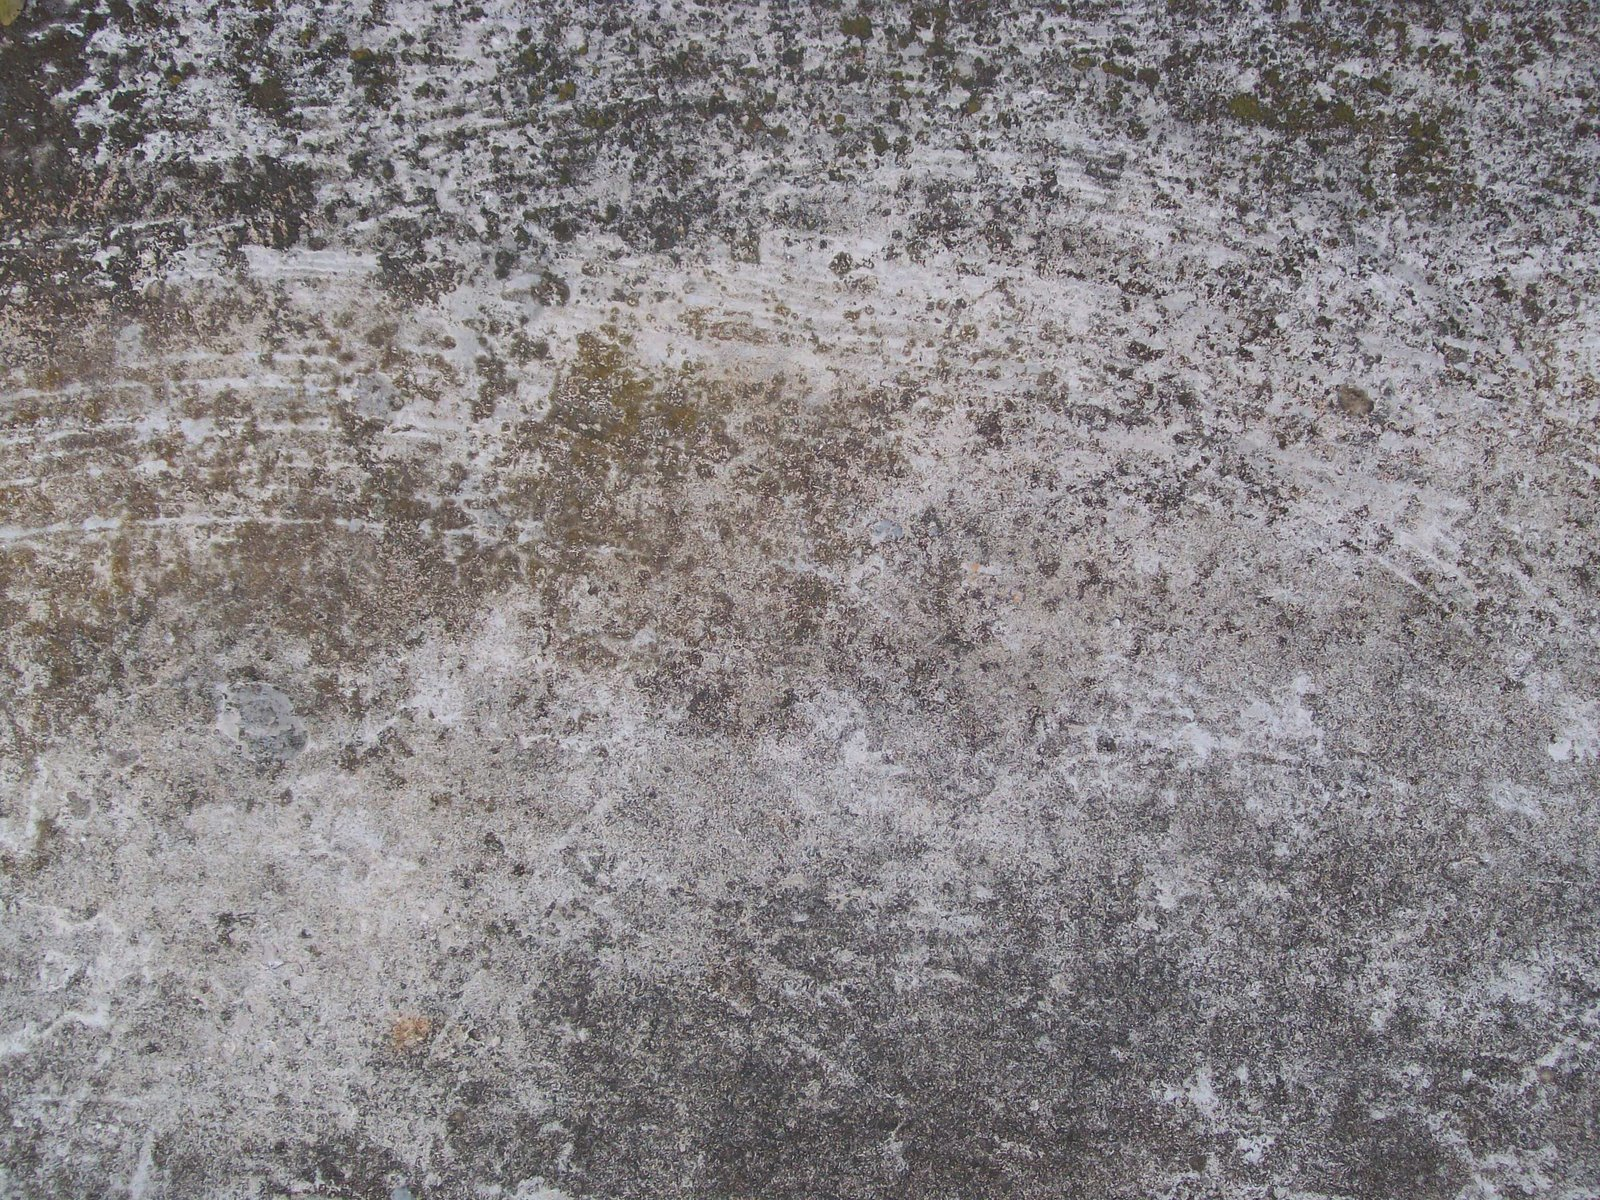 [weathered_ground2.jpg]